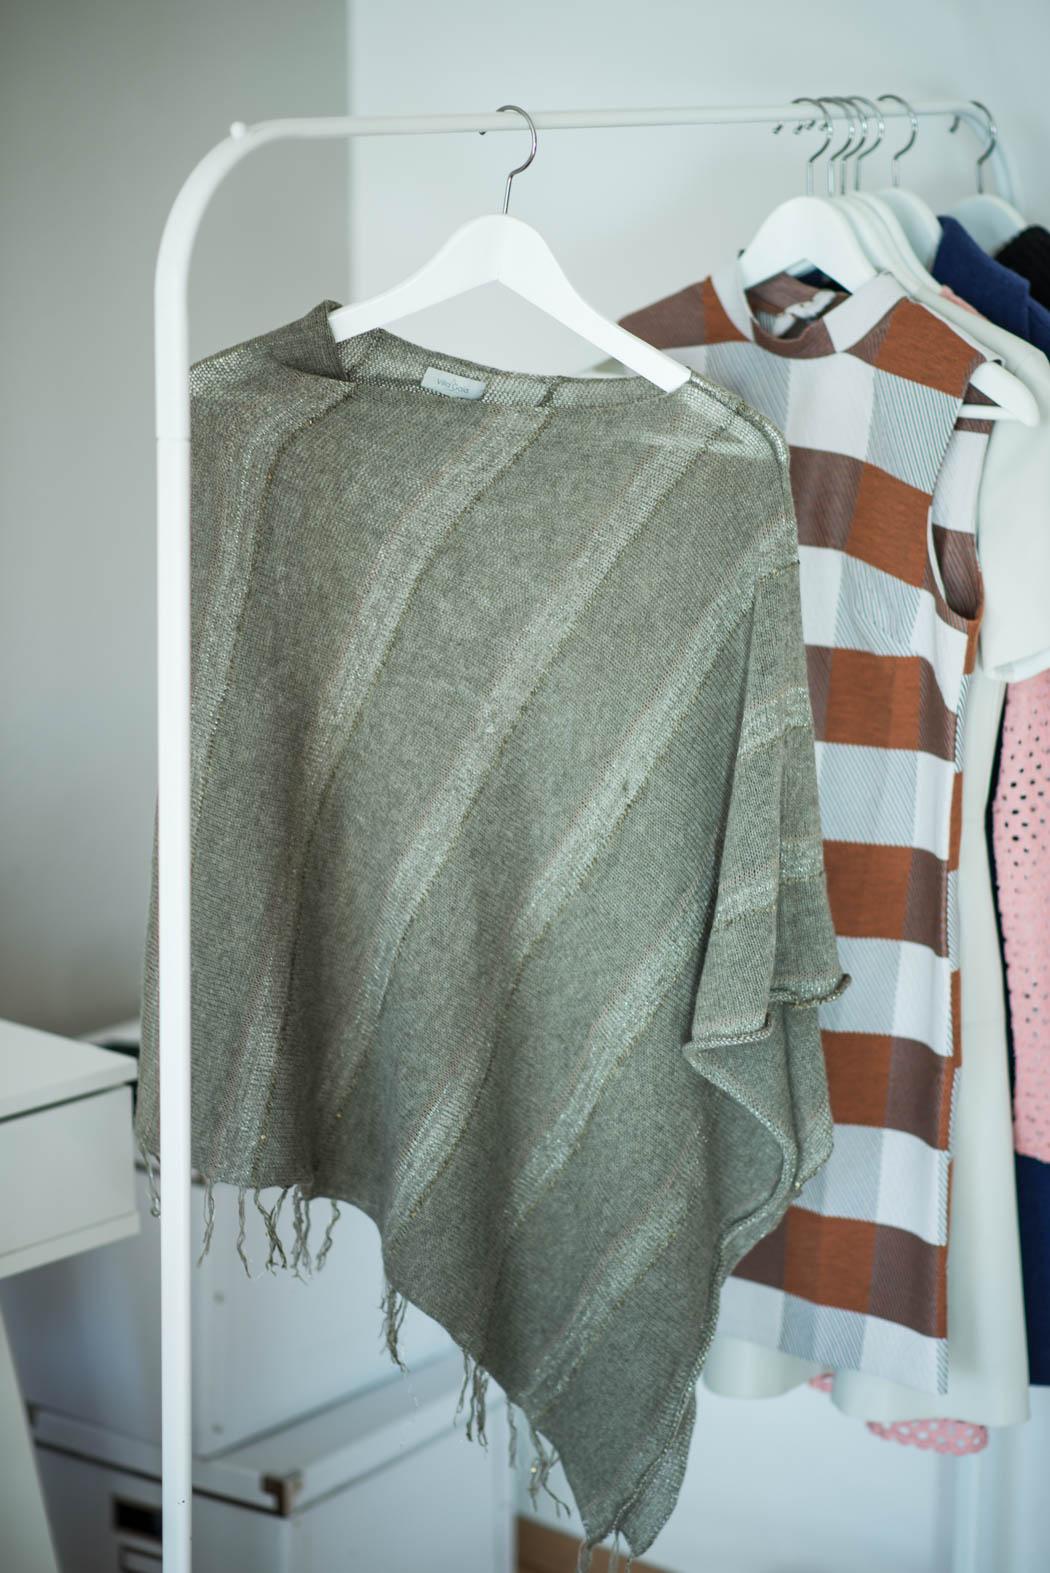 Shoppinghaul-Lindarella-Fashionblogger-München-Deutschland-Fashionblog-4